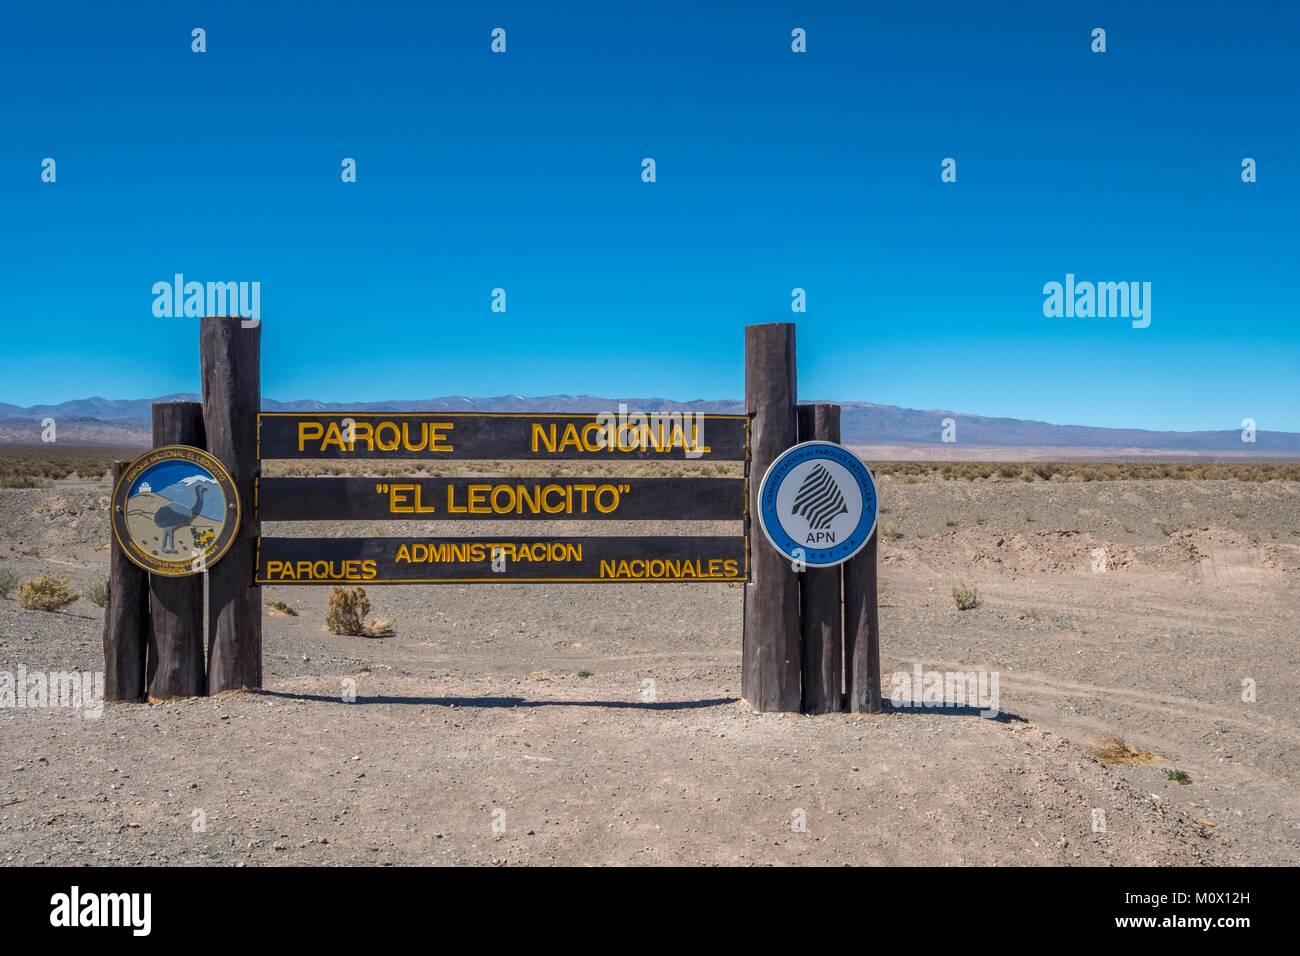 Argentina,San Juan Province,Barreal,El Leoncito national park - Stock Image